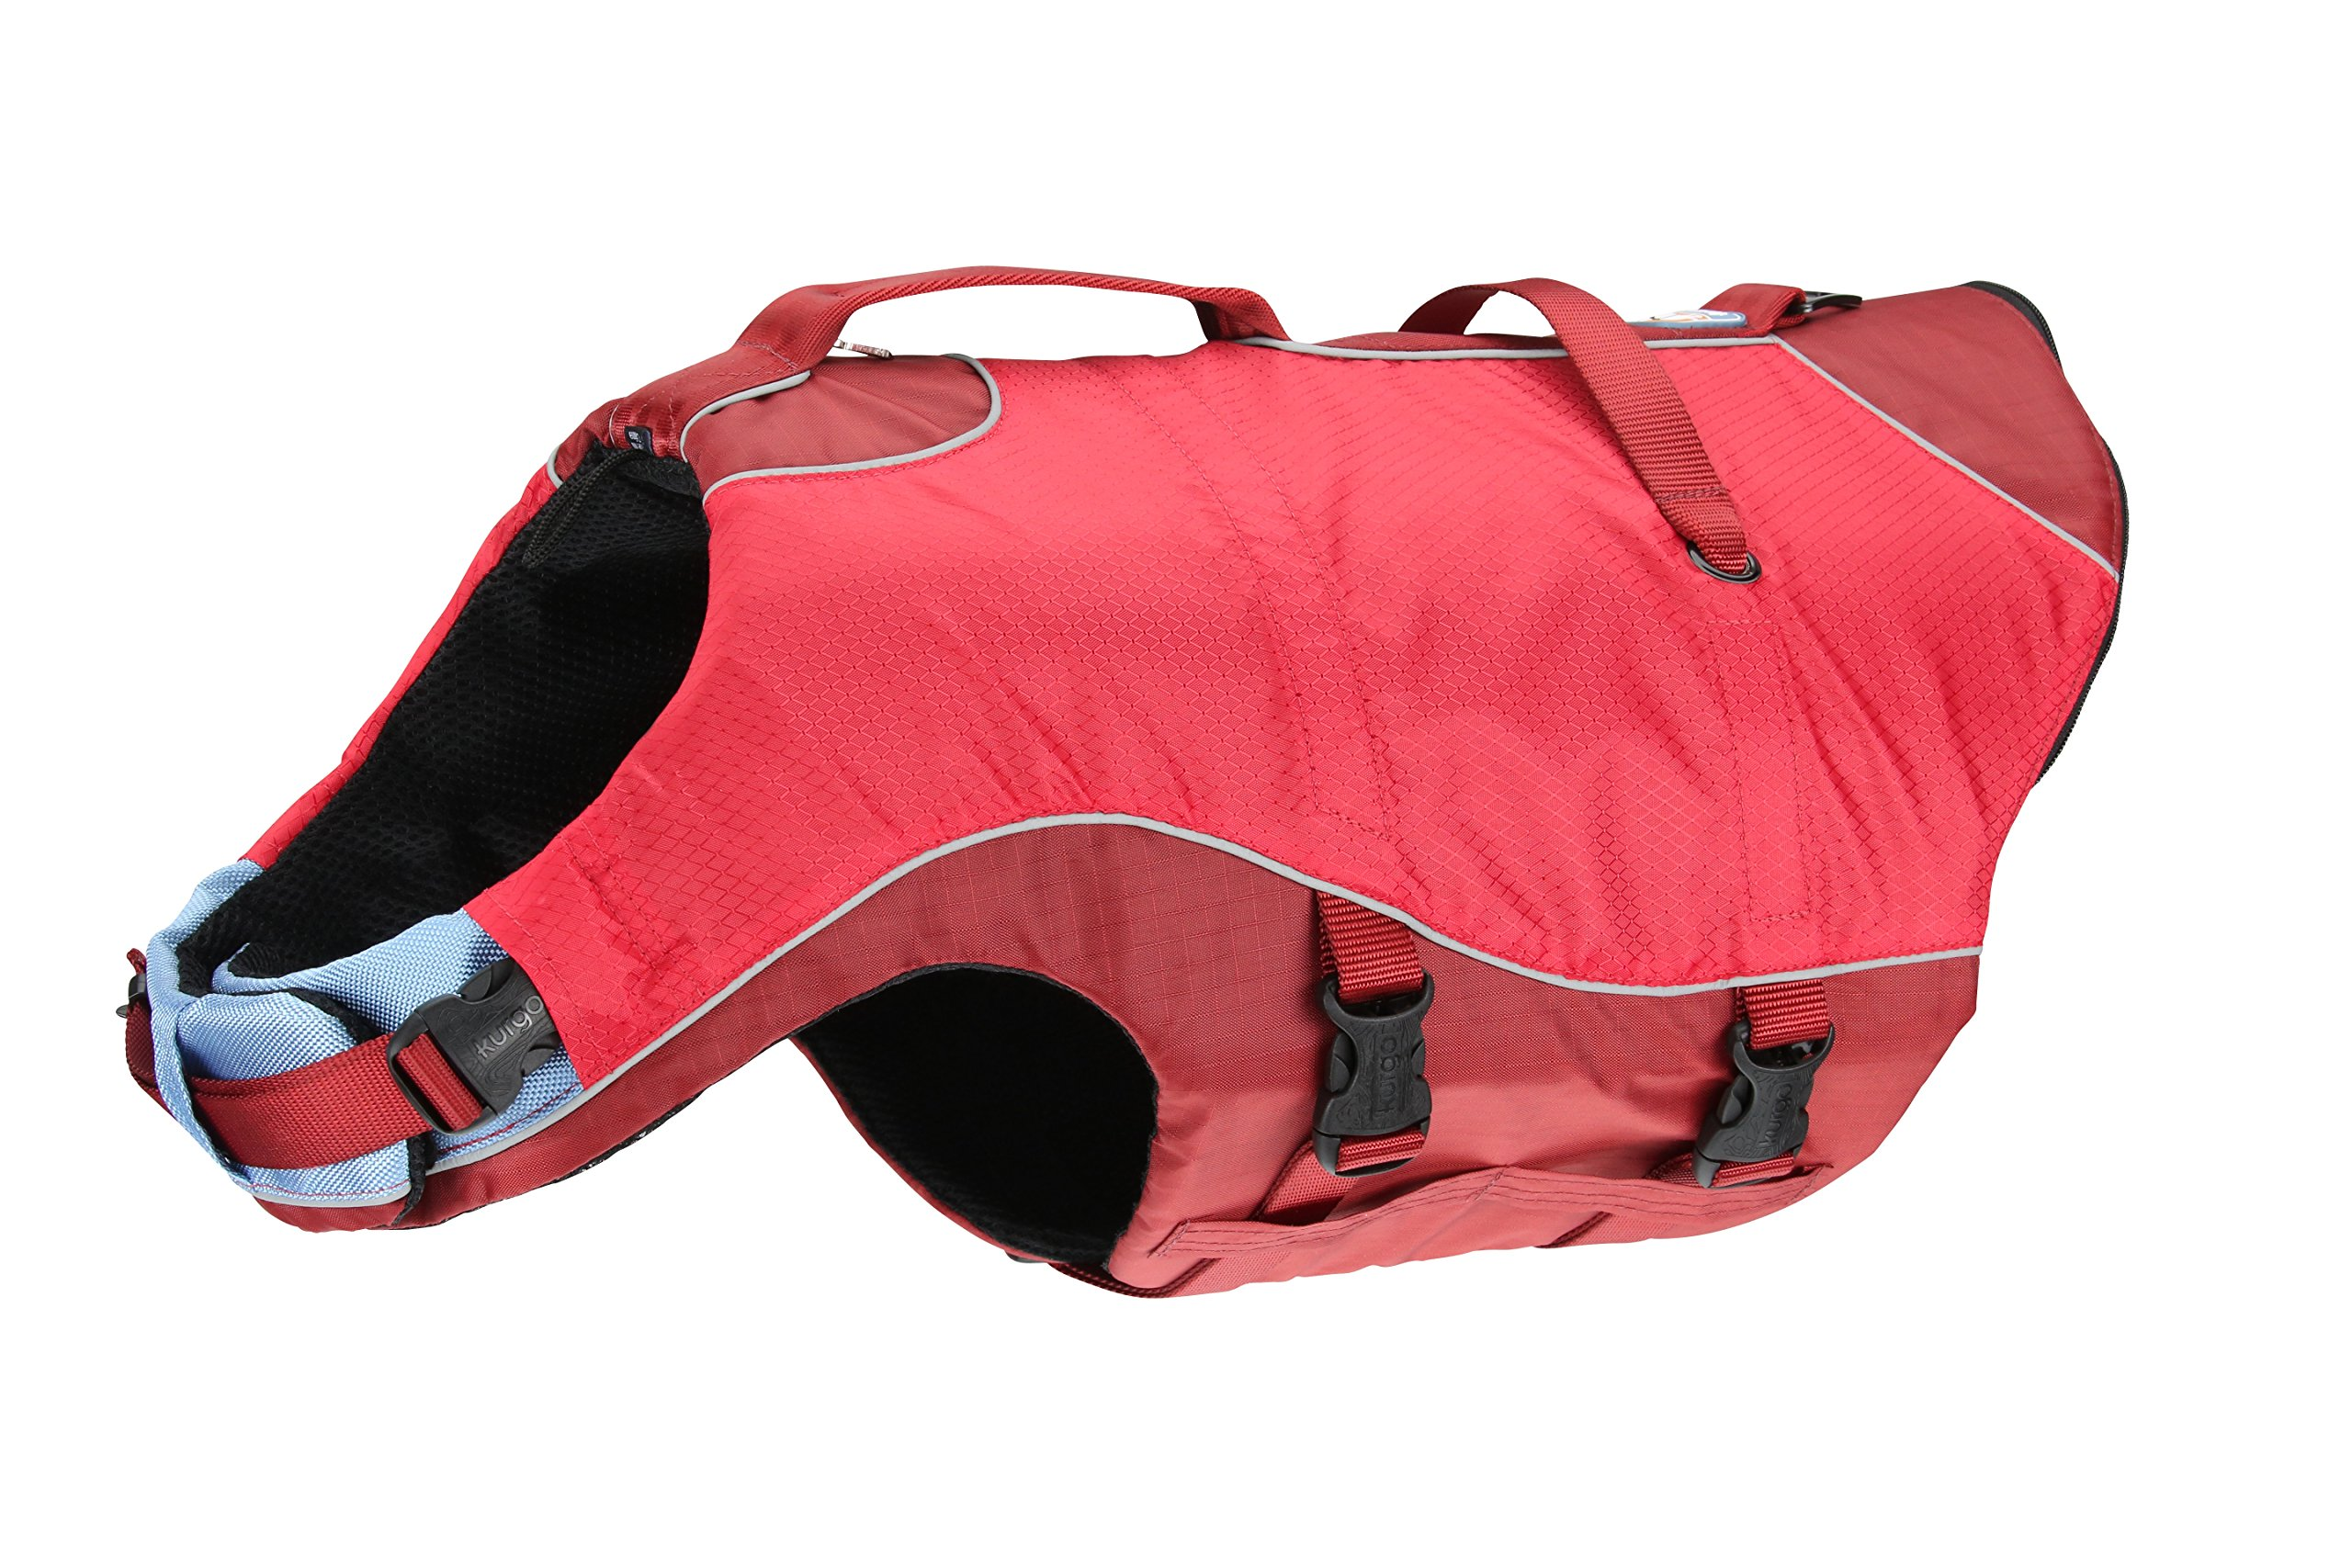 Kurgo Surf N Turf Dog Life Jacket - Adjustable with Reflective Trim, Small, Red by Kurgo